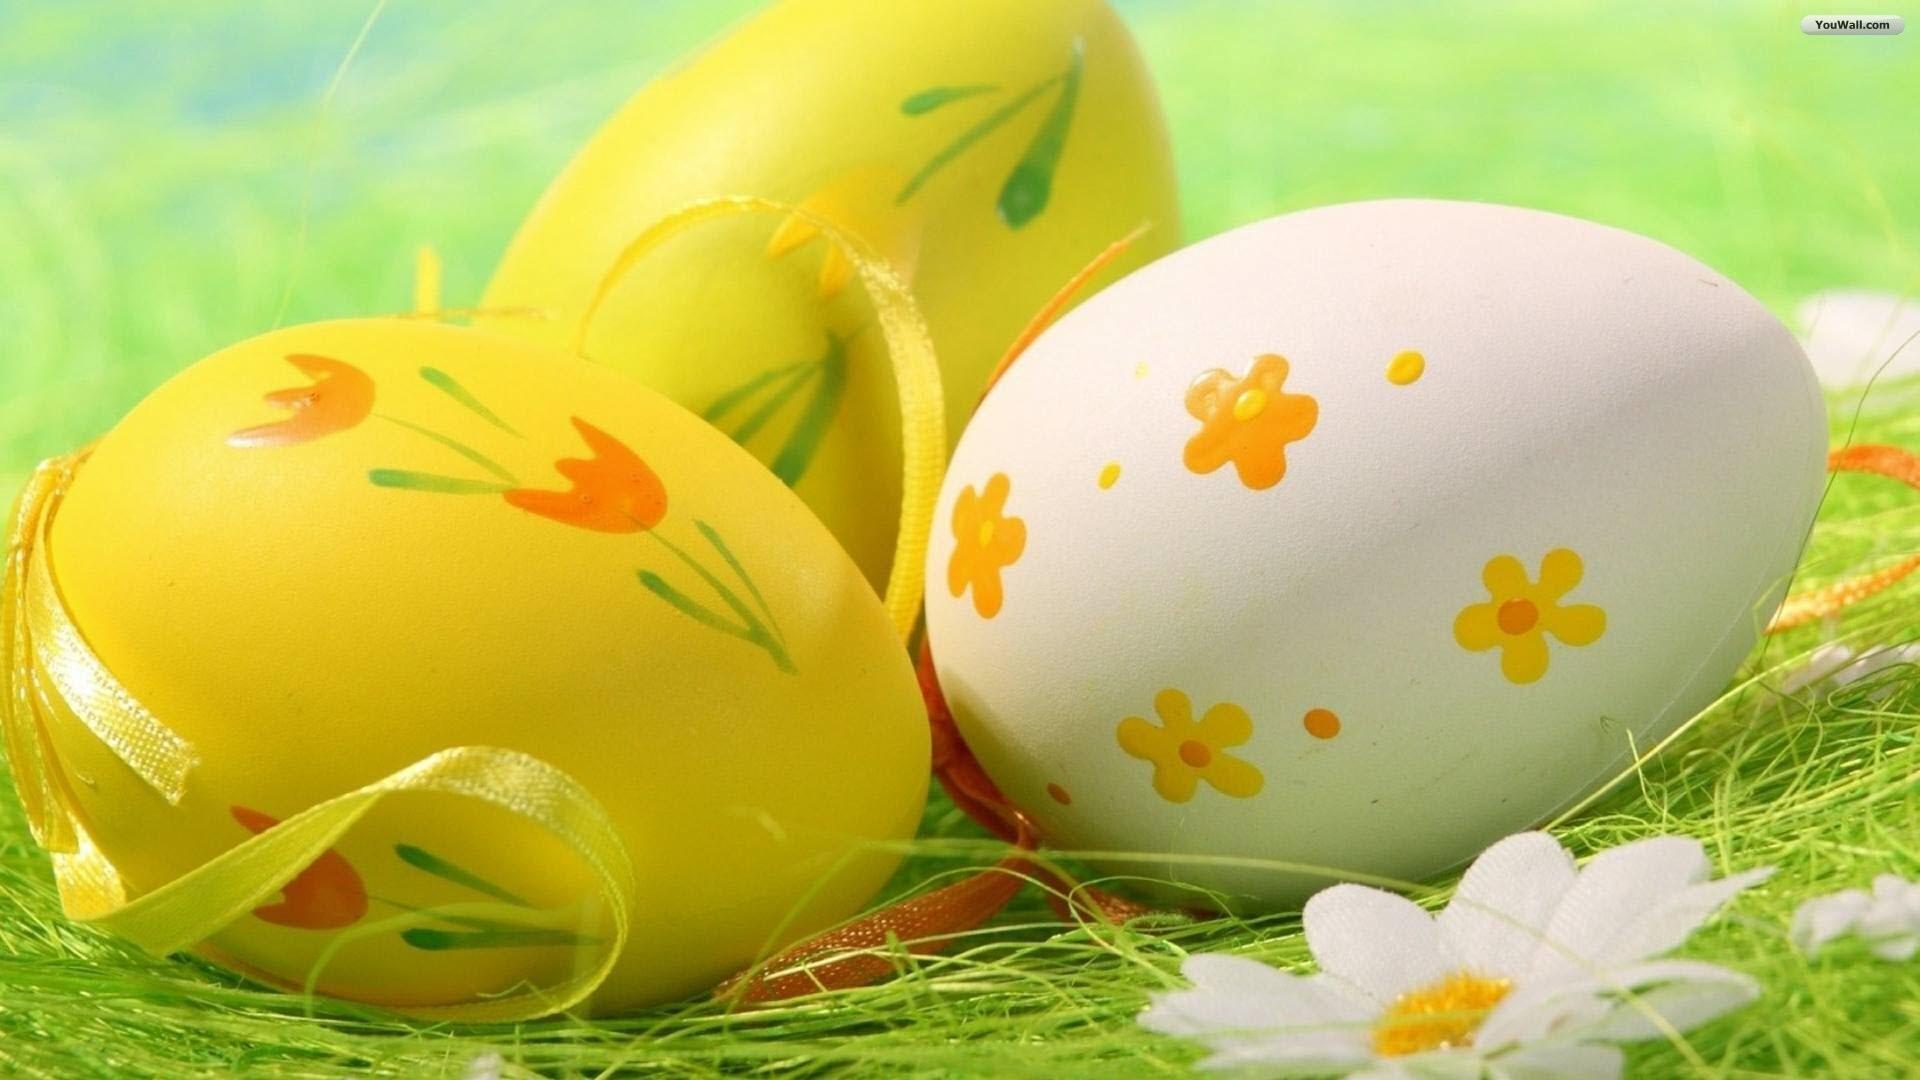 Easter egg desktop wallpaper 60 images - Easter desktop wallpaper ...